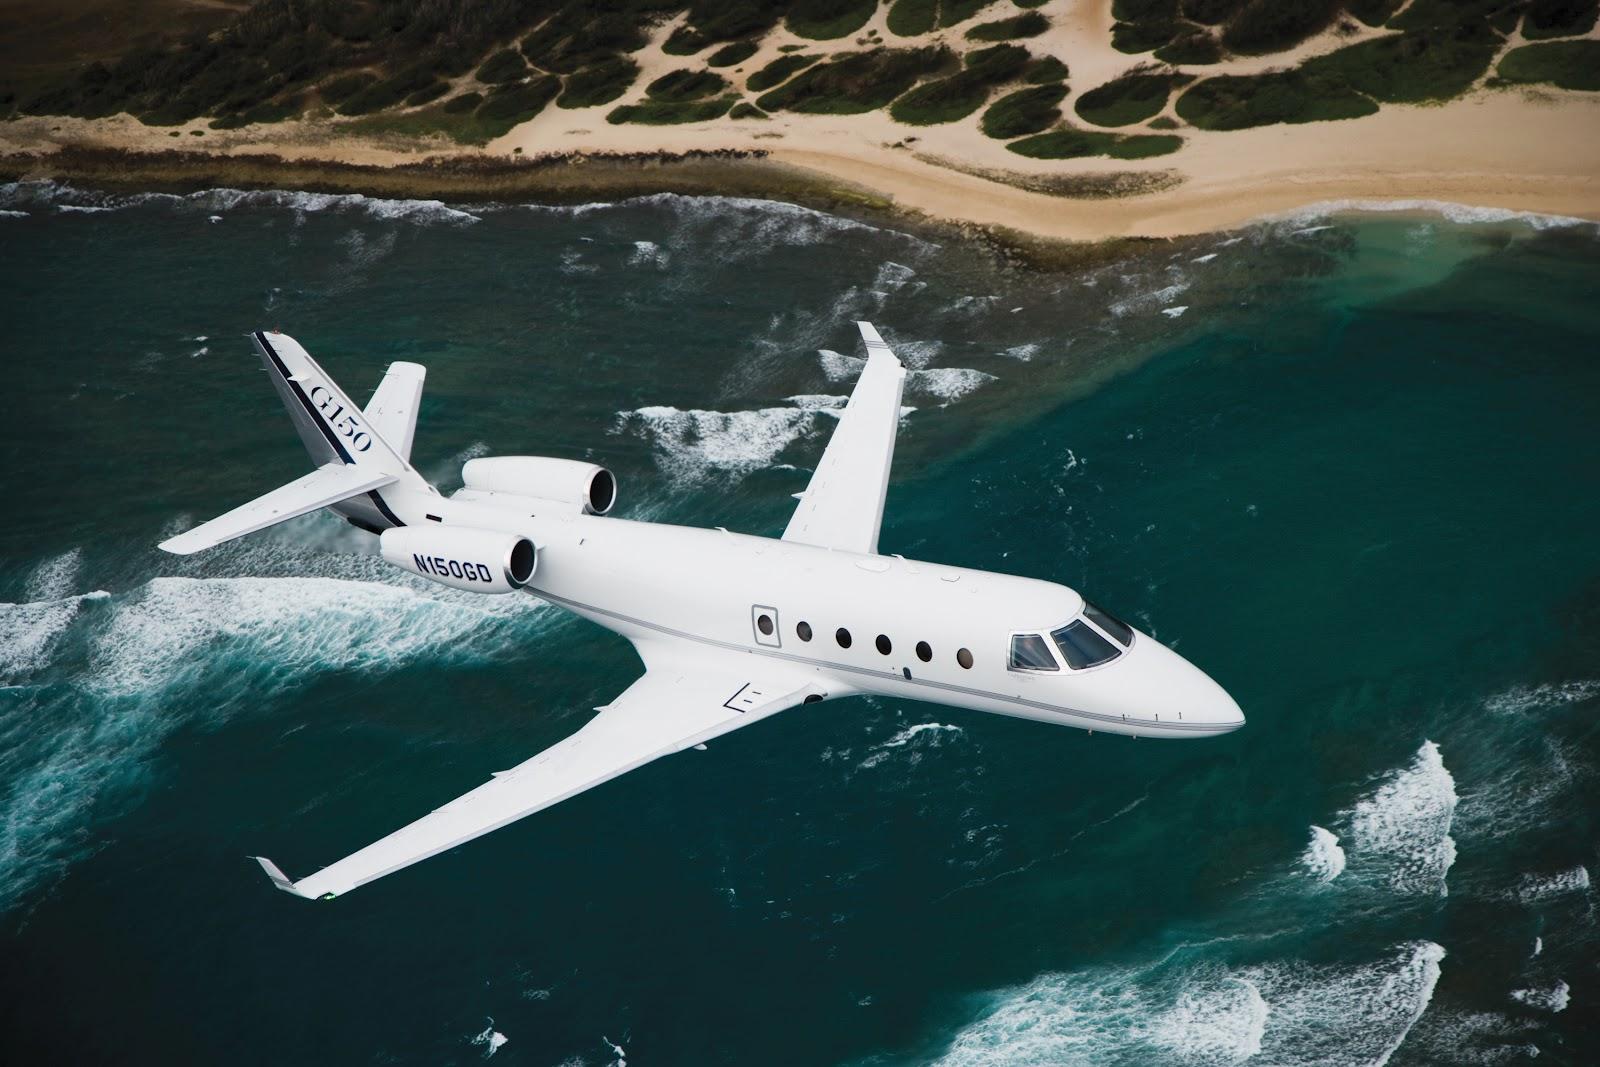 http://2.bp.blogspot.com/-fieRUCNlpEE/UAQvdHHQd9I/AAAAAAAAKqg/87OpnC81I_c/s1600/aerospatiale_gulfstream_g150_ocean_flight.jpg